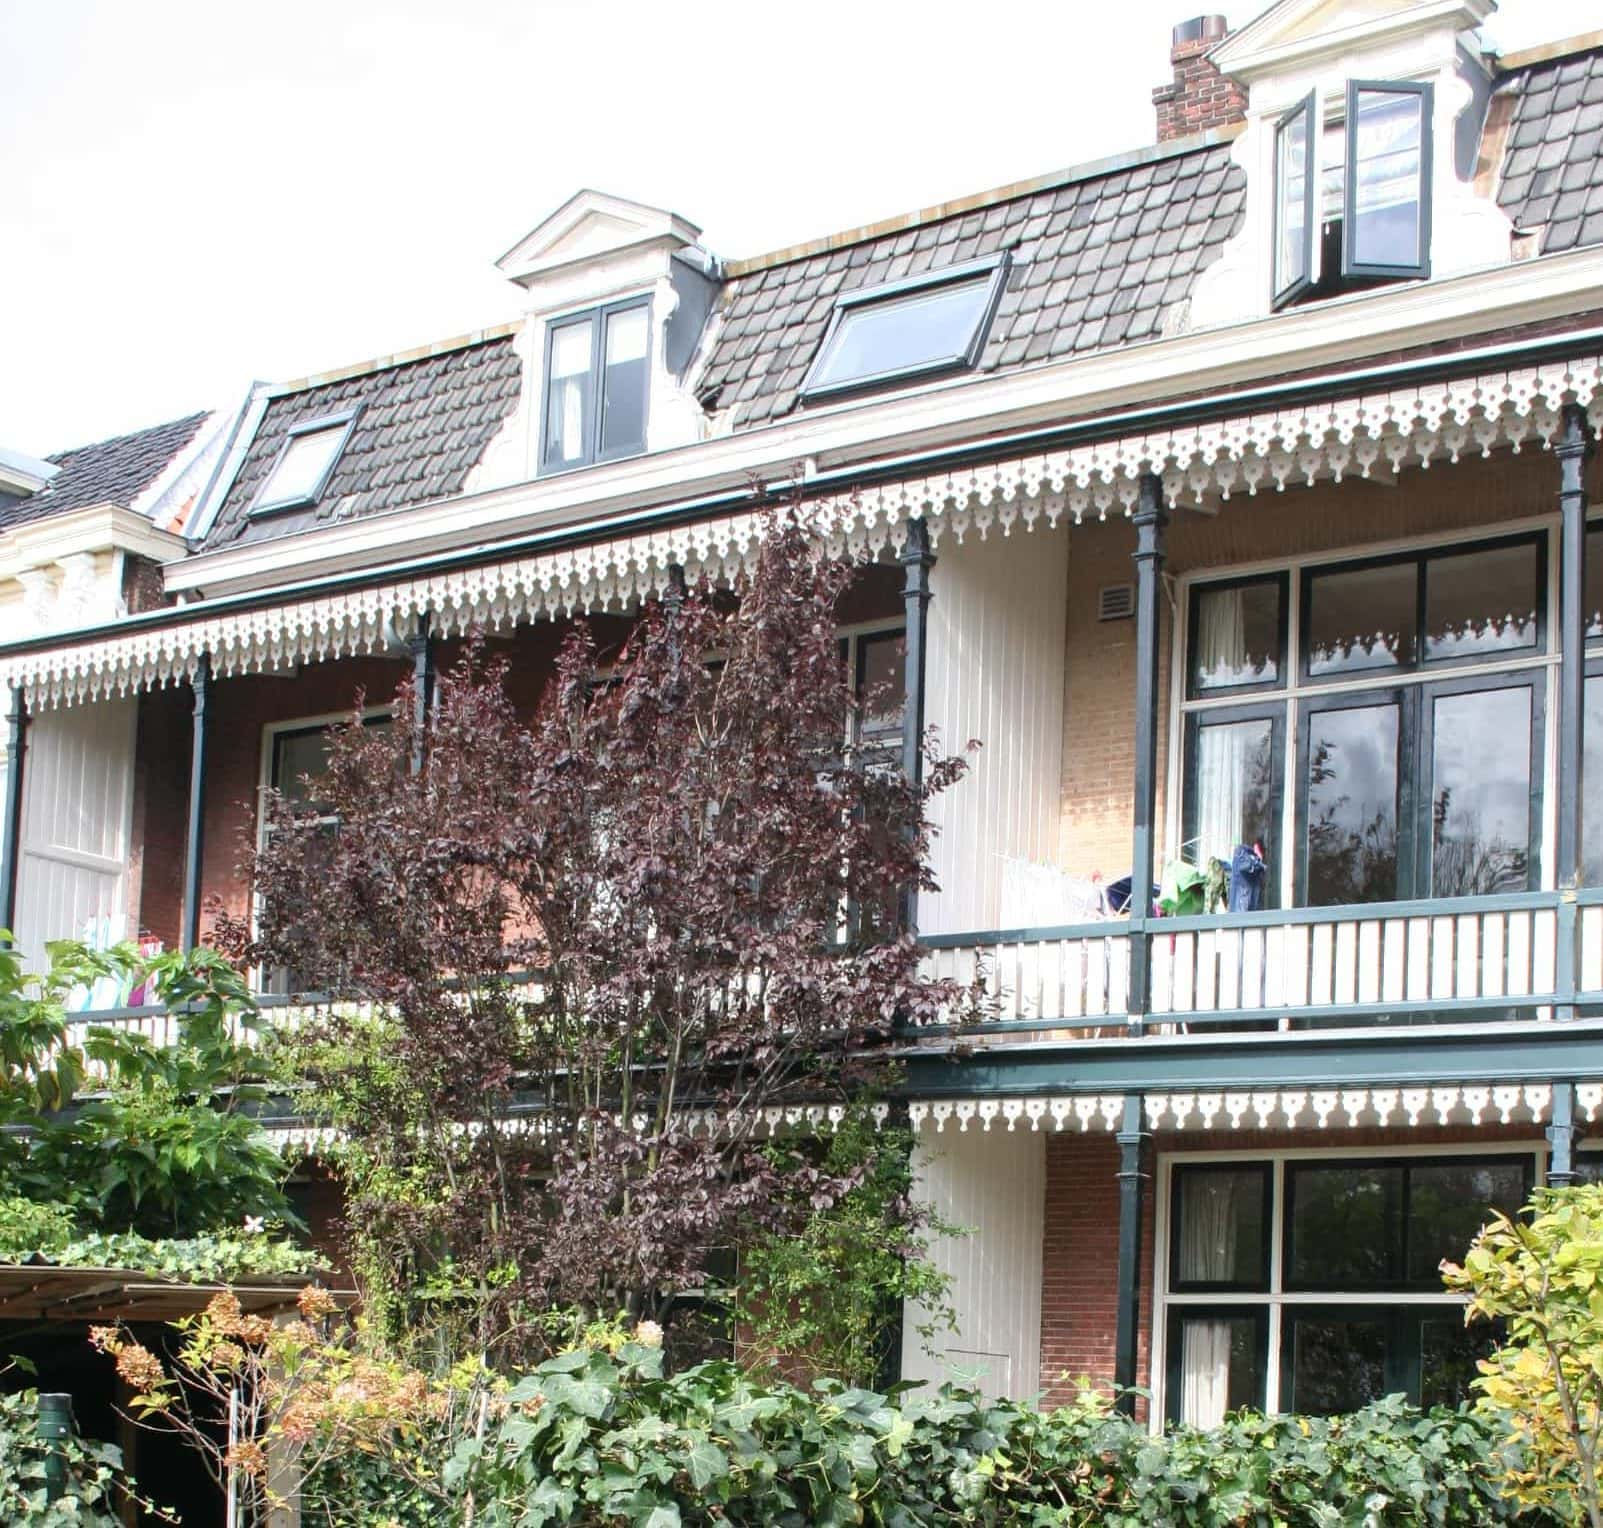 Plantsoen in Leiden veranda's